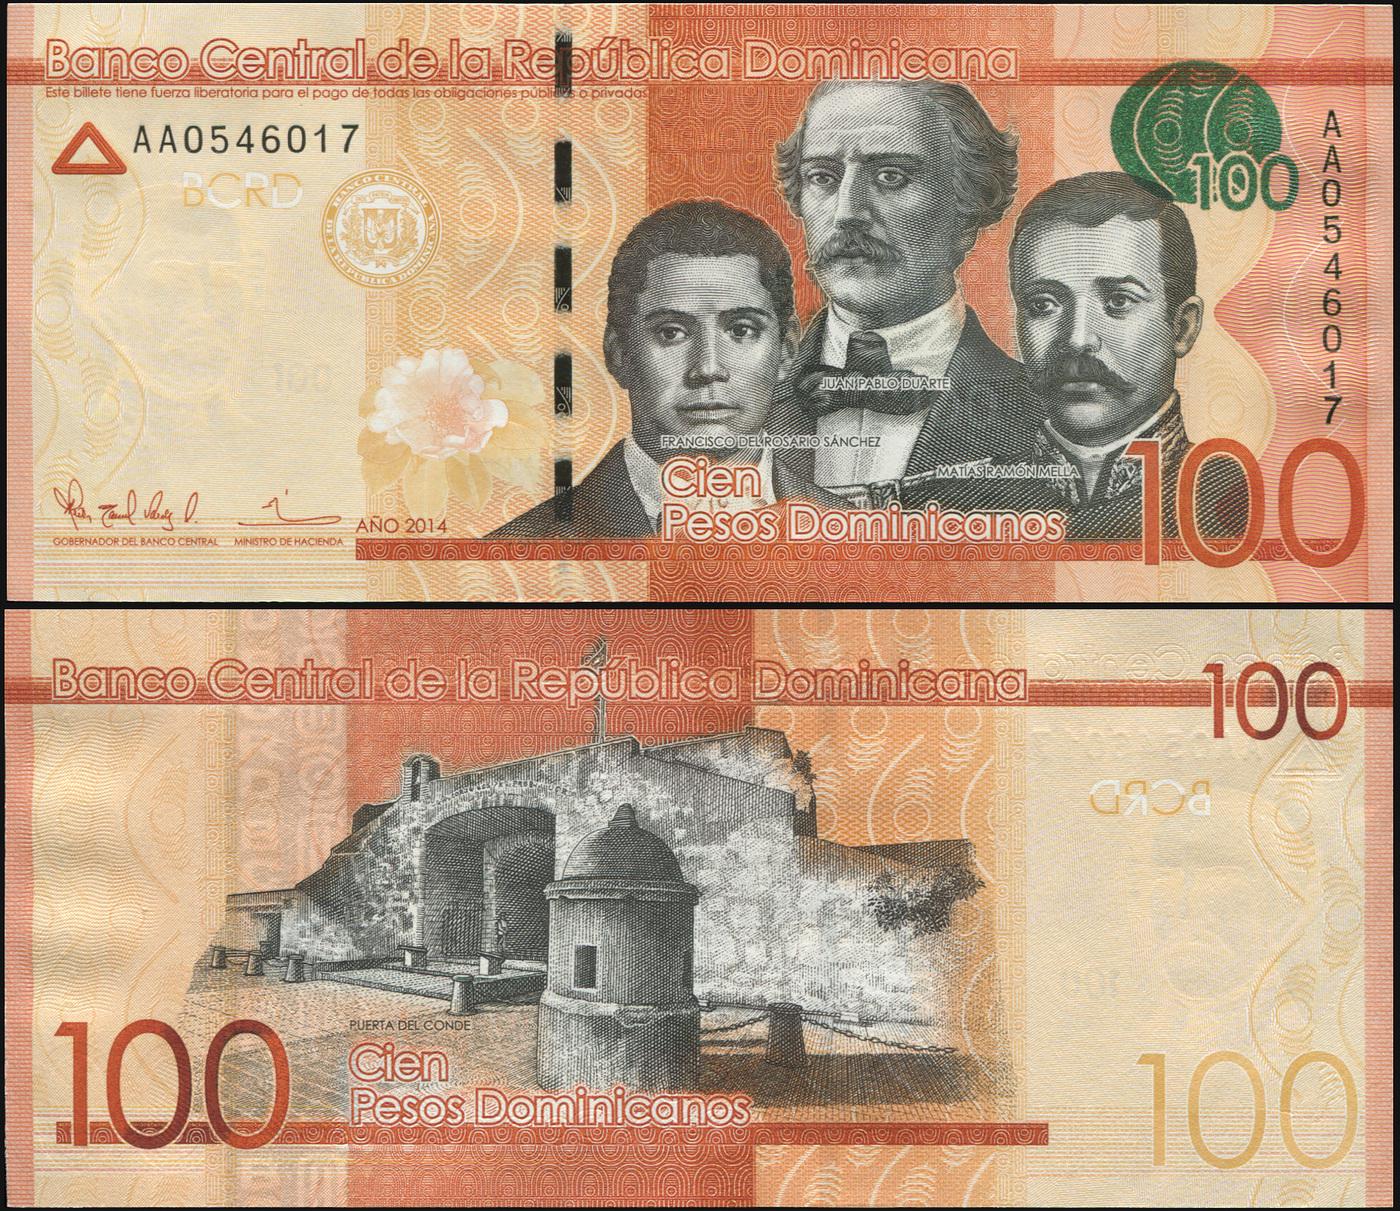 Банкнота. Доминиканская республика 100 песо доминикано. 2014 UNC. Кат.P.190a